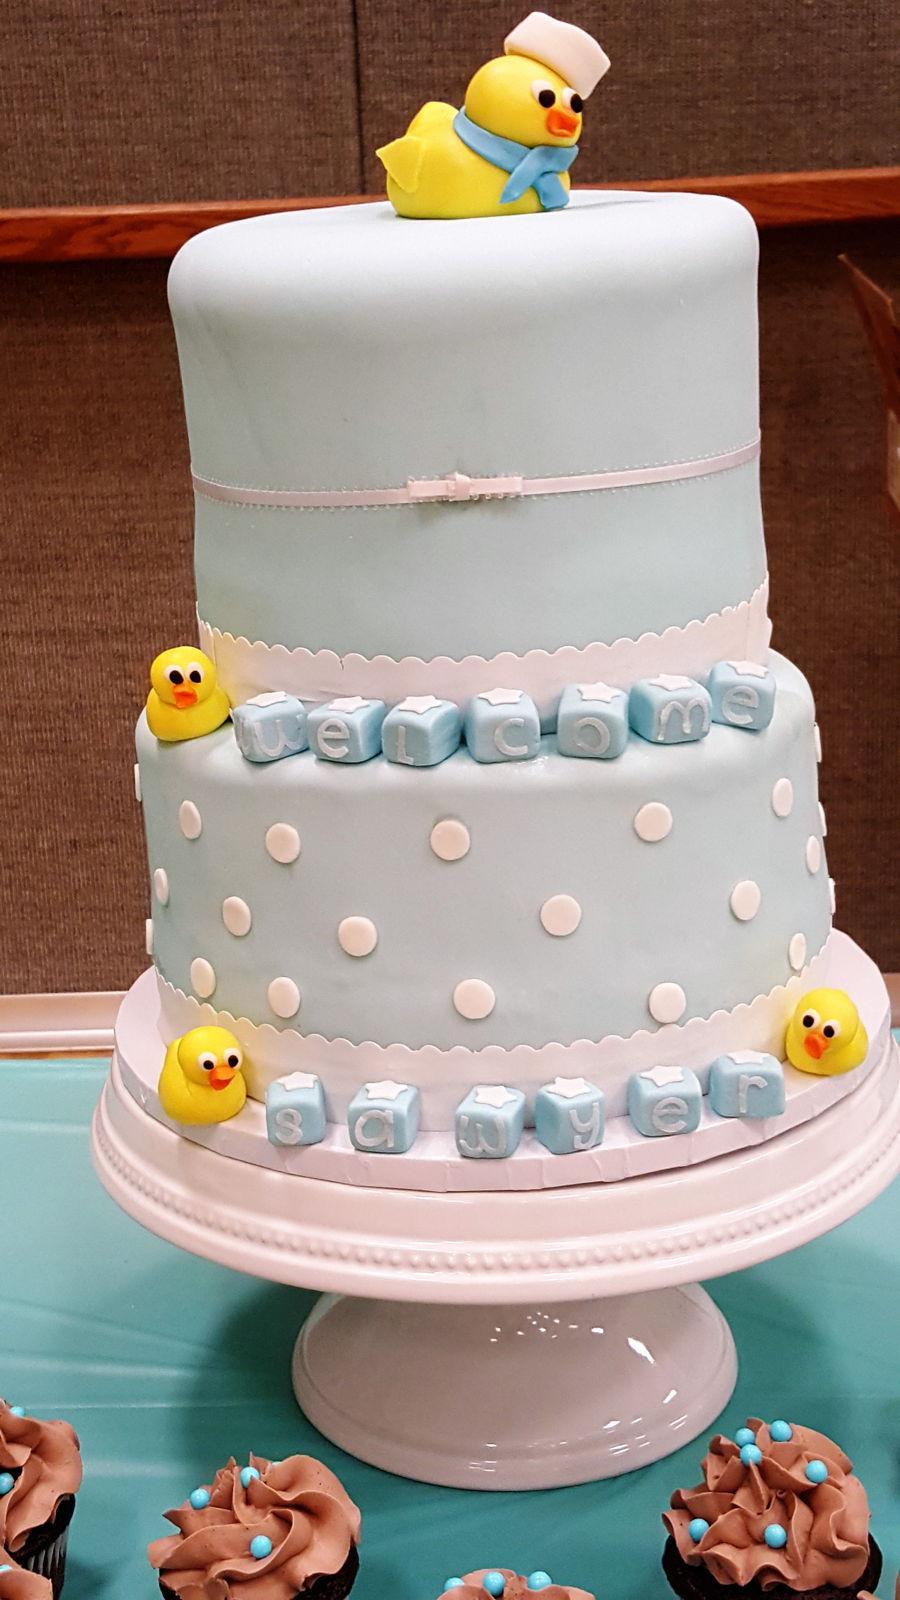 Rubber Ducks On Wedding Cake